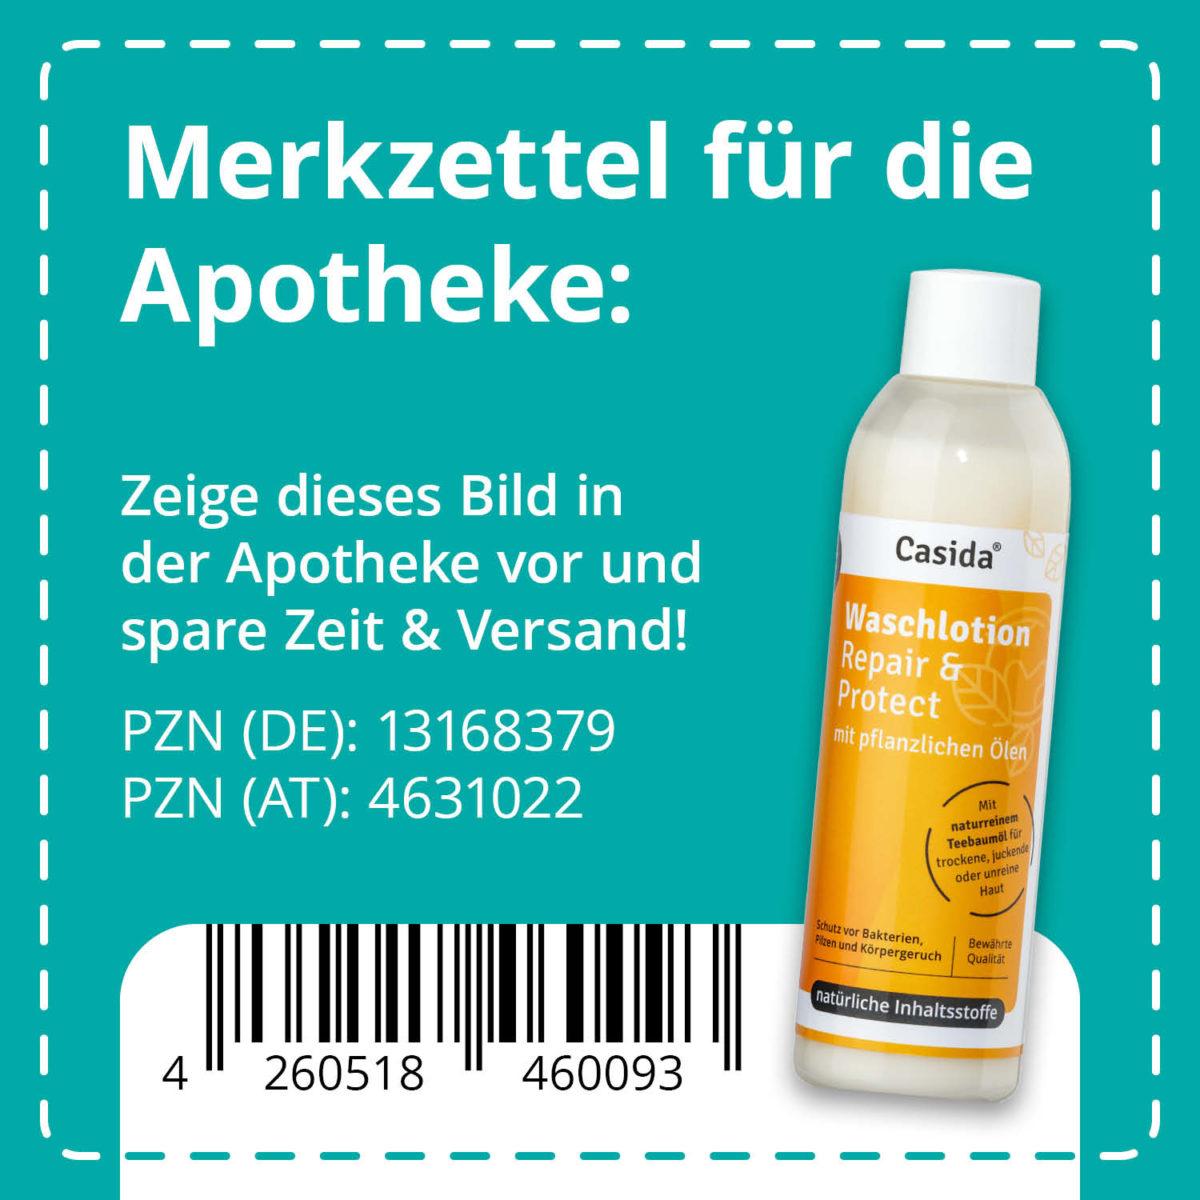 Casida Washing Lotion Repair & Protect 200 ml PZN DE 13168379 PZN AT 4631022 UVP 14,95 € EAN 4260518460093